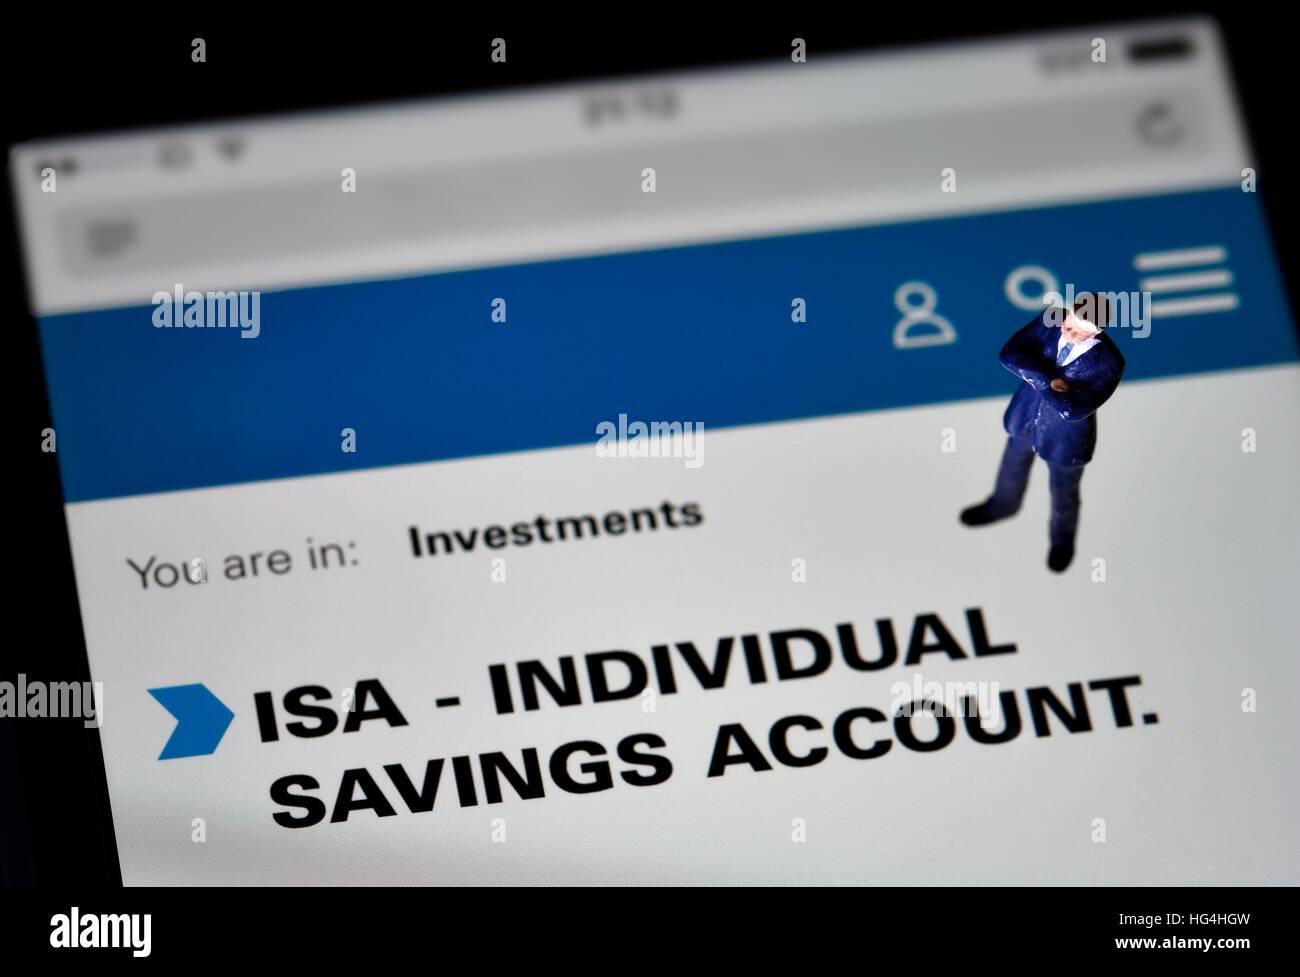 ISA individual savings account iphone screen page web page - Stock Image